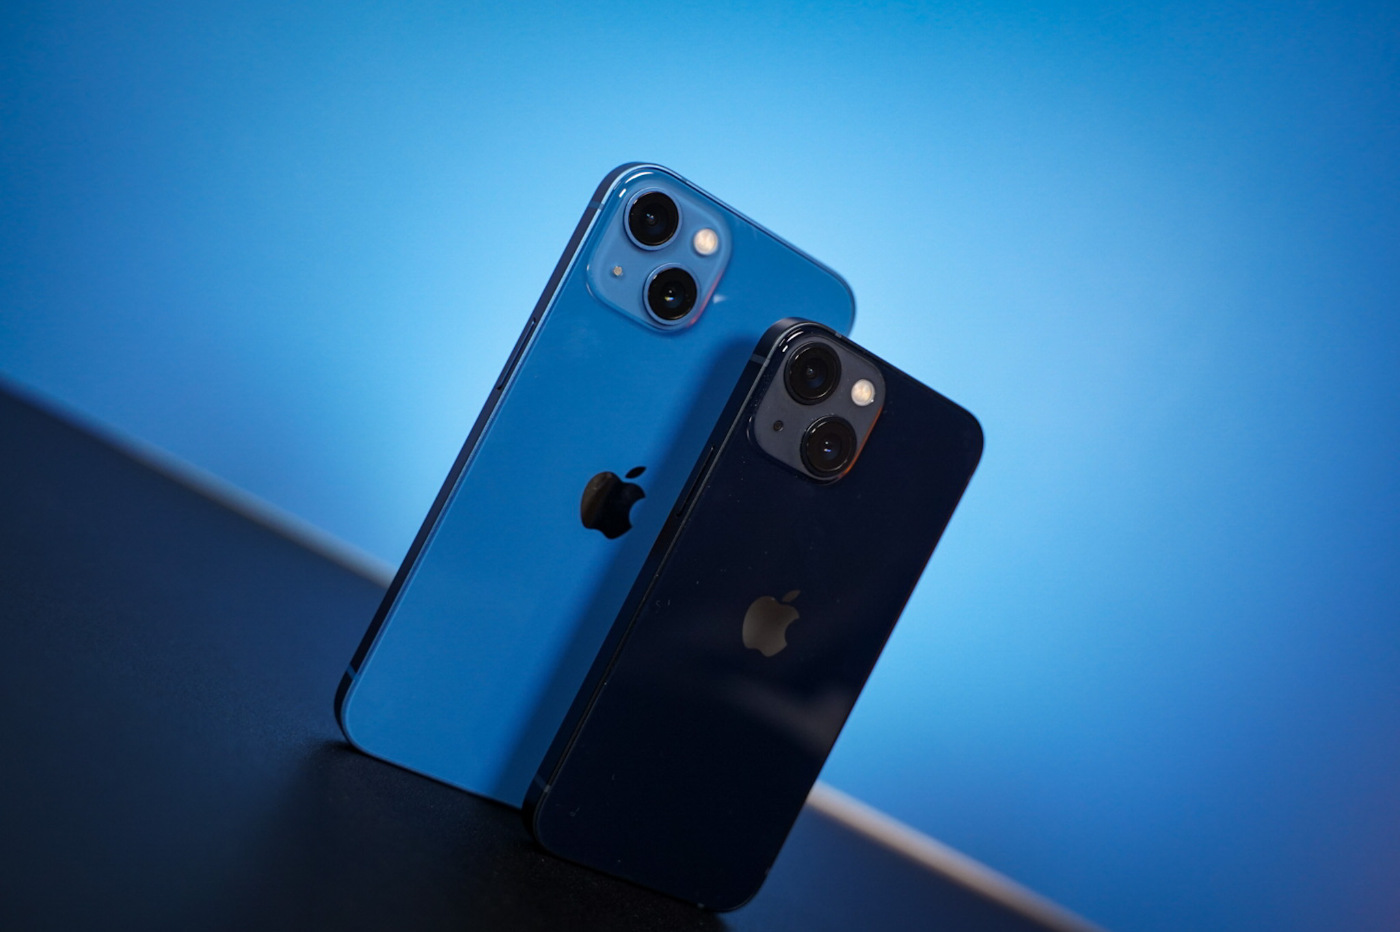 iphone 13 vs 13 mini